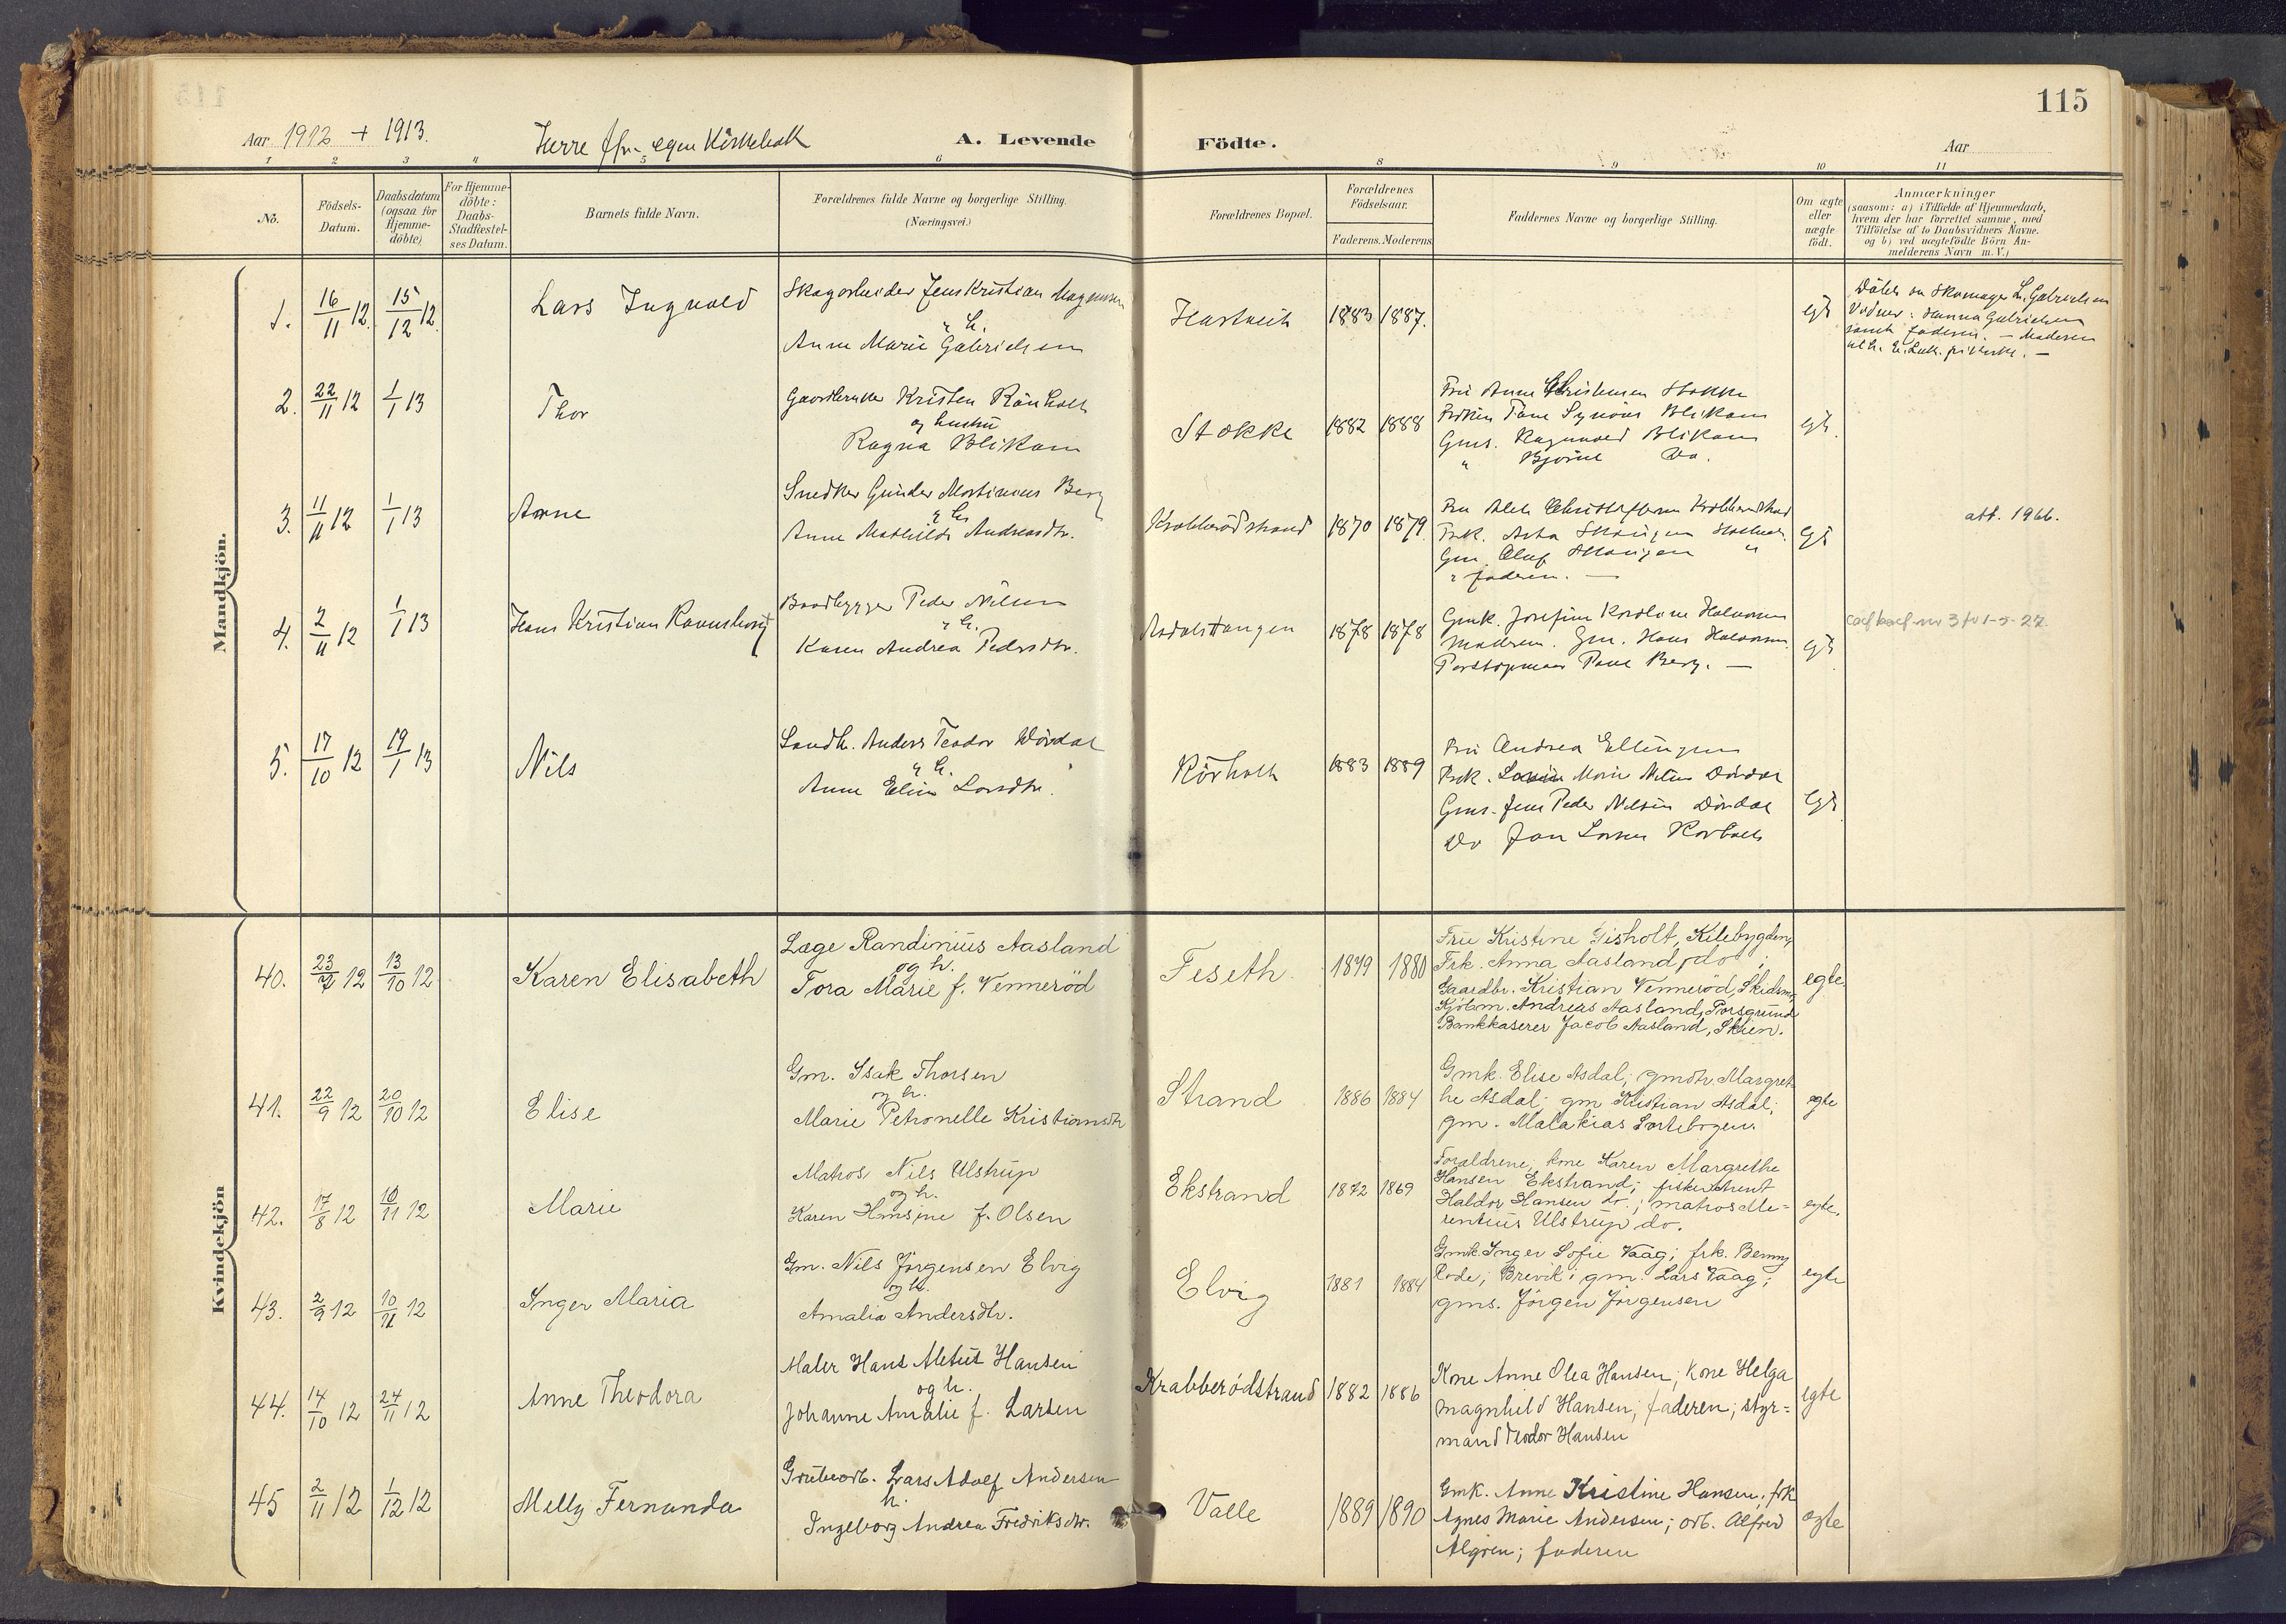 SAKO, Bamble kirkebøker, F/Fa/L0009: Ministerialbok nr. I 9, 1901-1917, s. 115